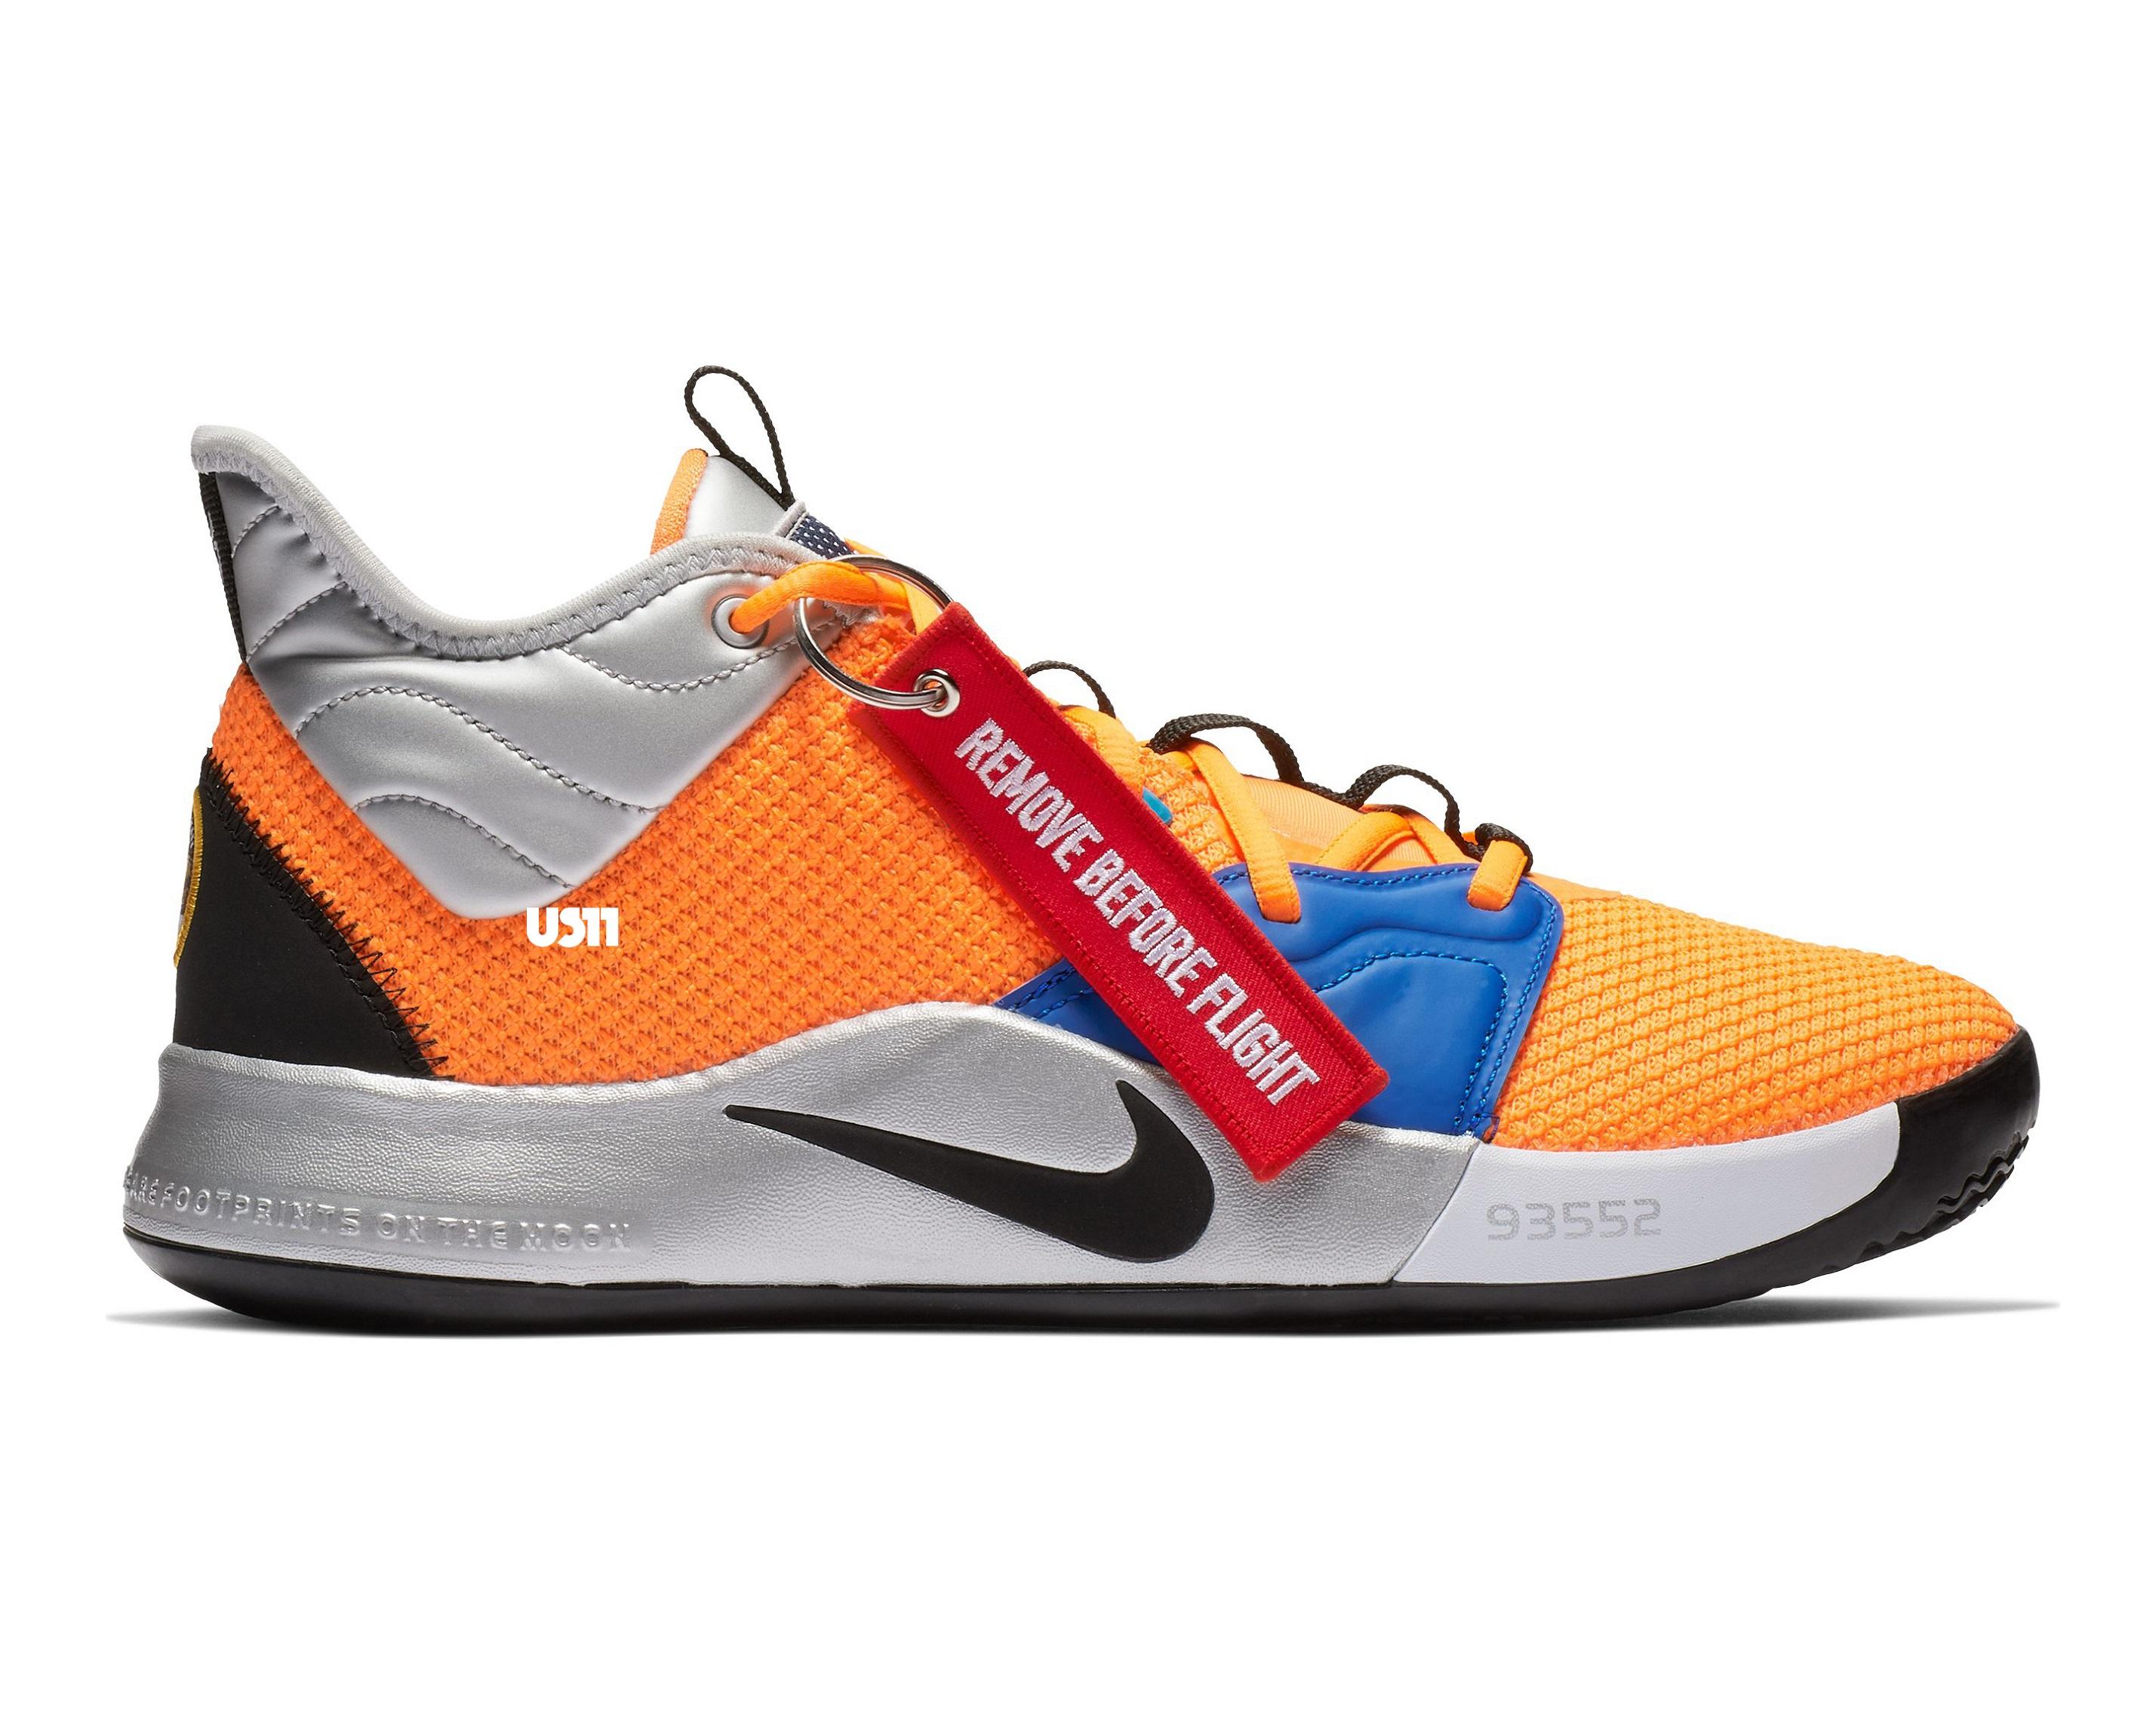 best looking nike shoes